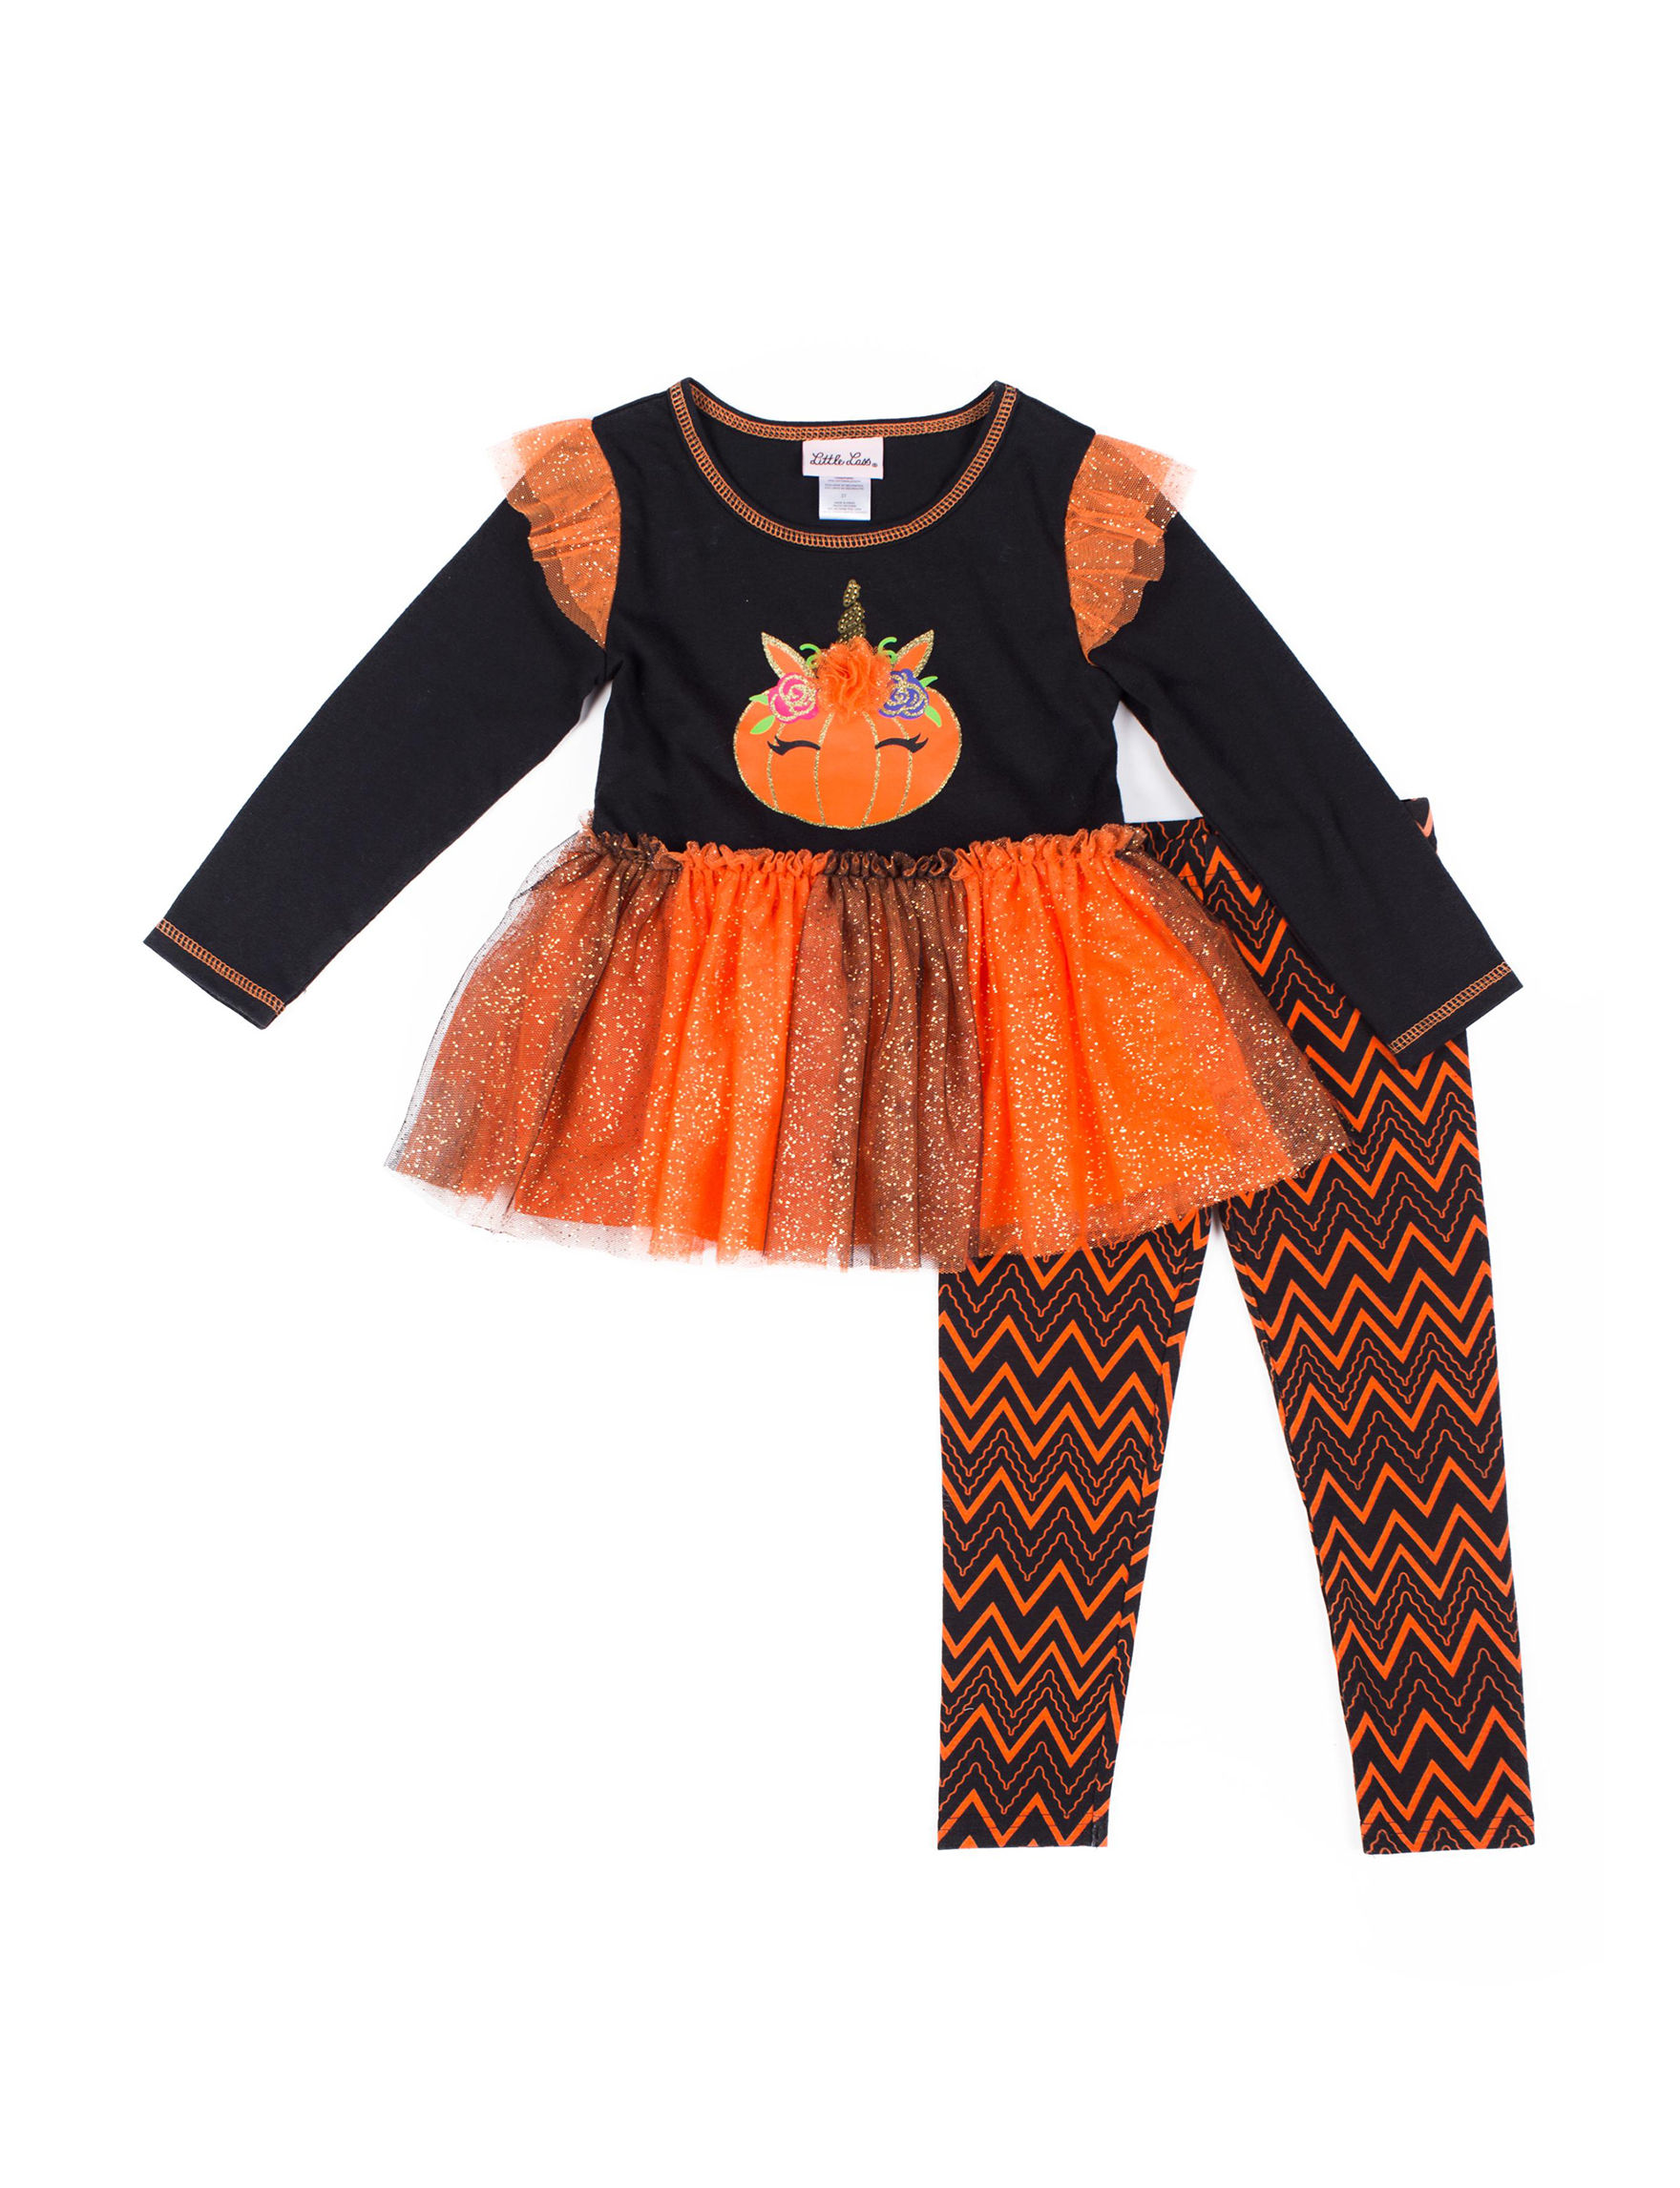 Little Lass Black / Orange